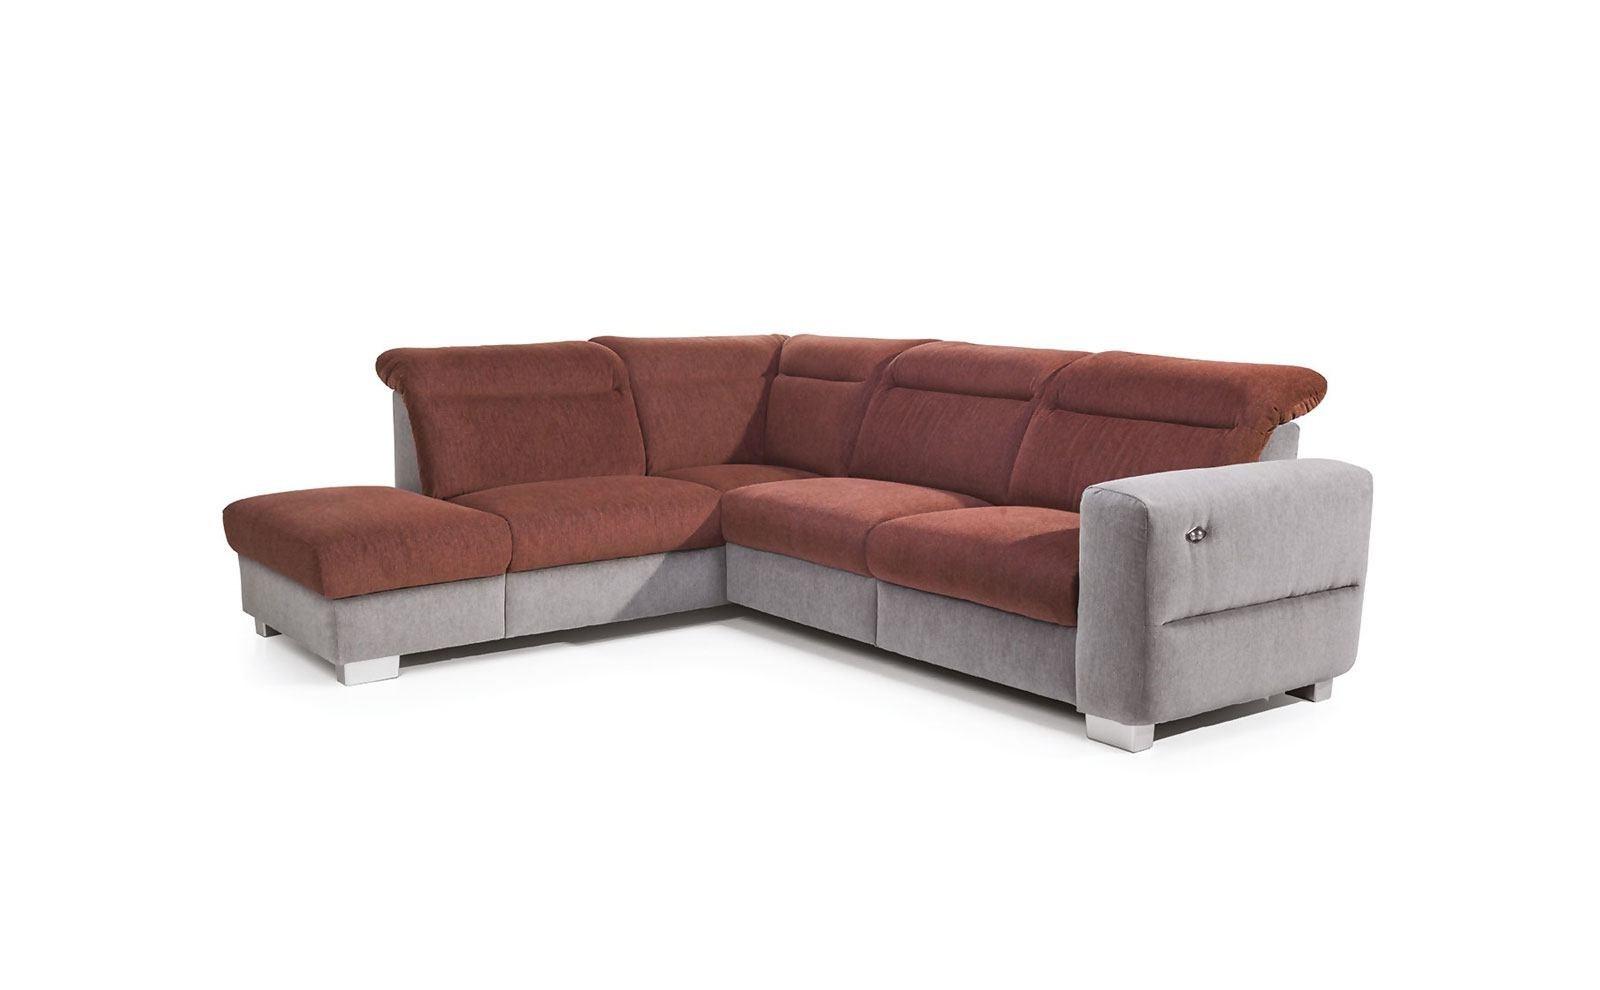 Coltar fix cu mecanism Relax, cu sezlong pe stanga Ferra, l270xA230xH90 cm